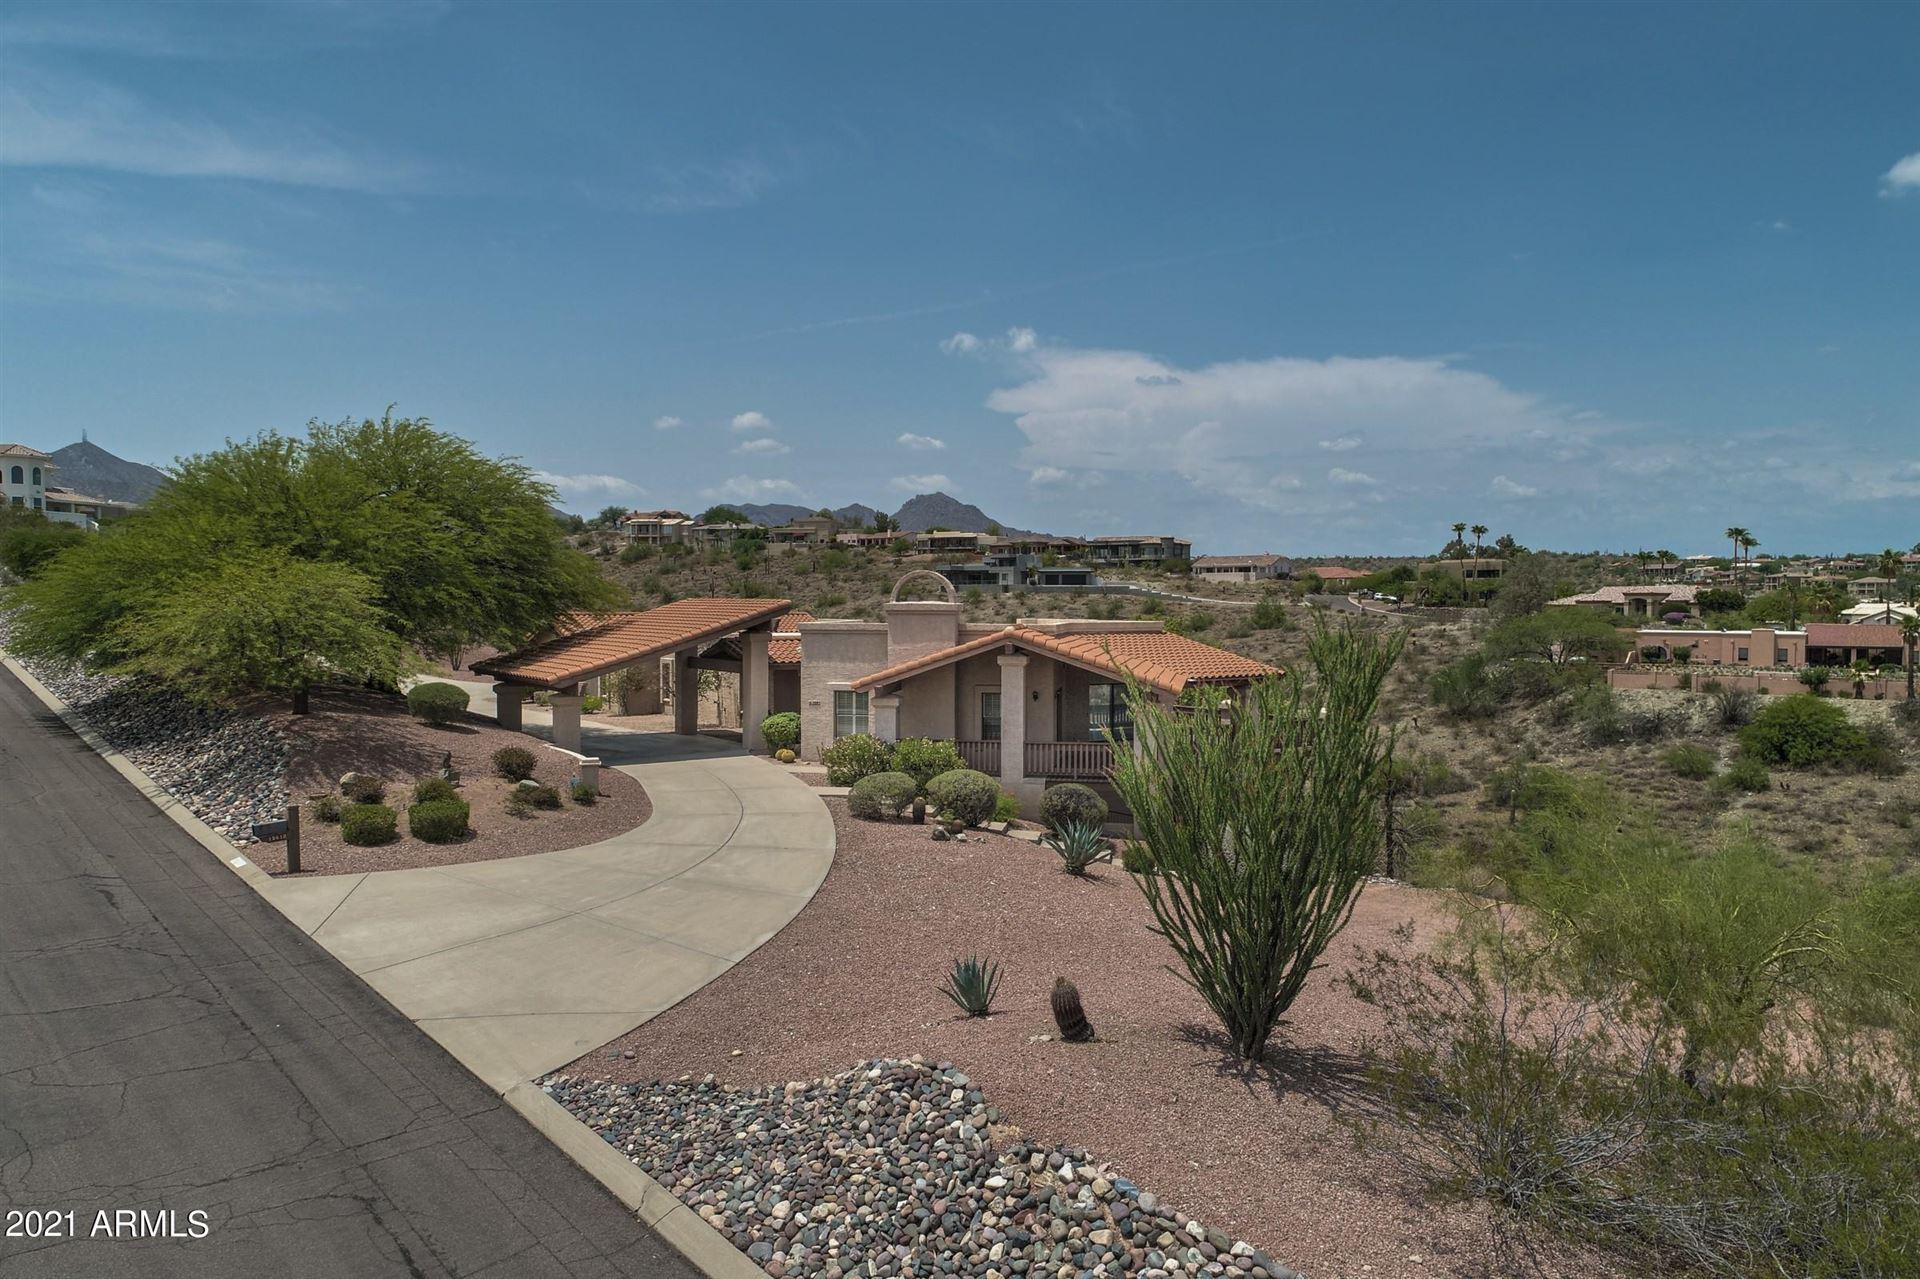 Photo of 15610 E JAMAICA Lane, Fountain Hills, AZ 85268 (MLS # 6266328)